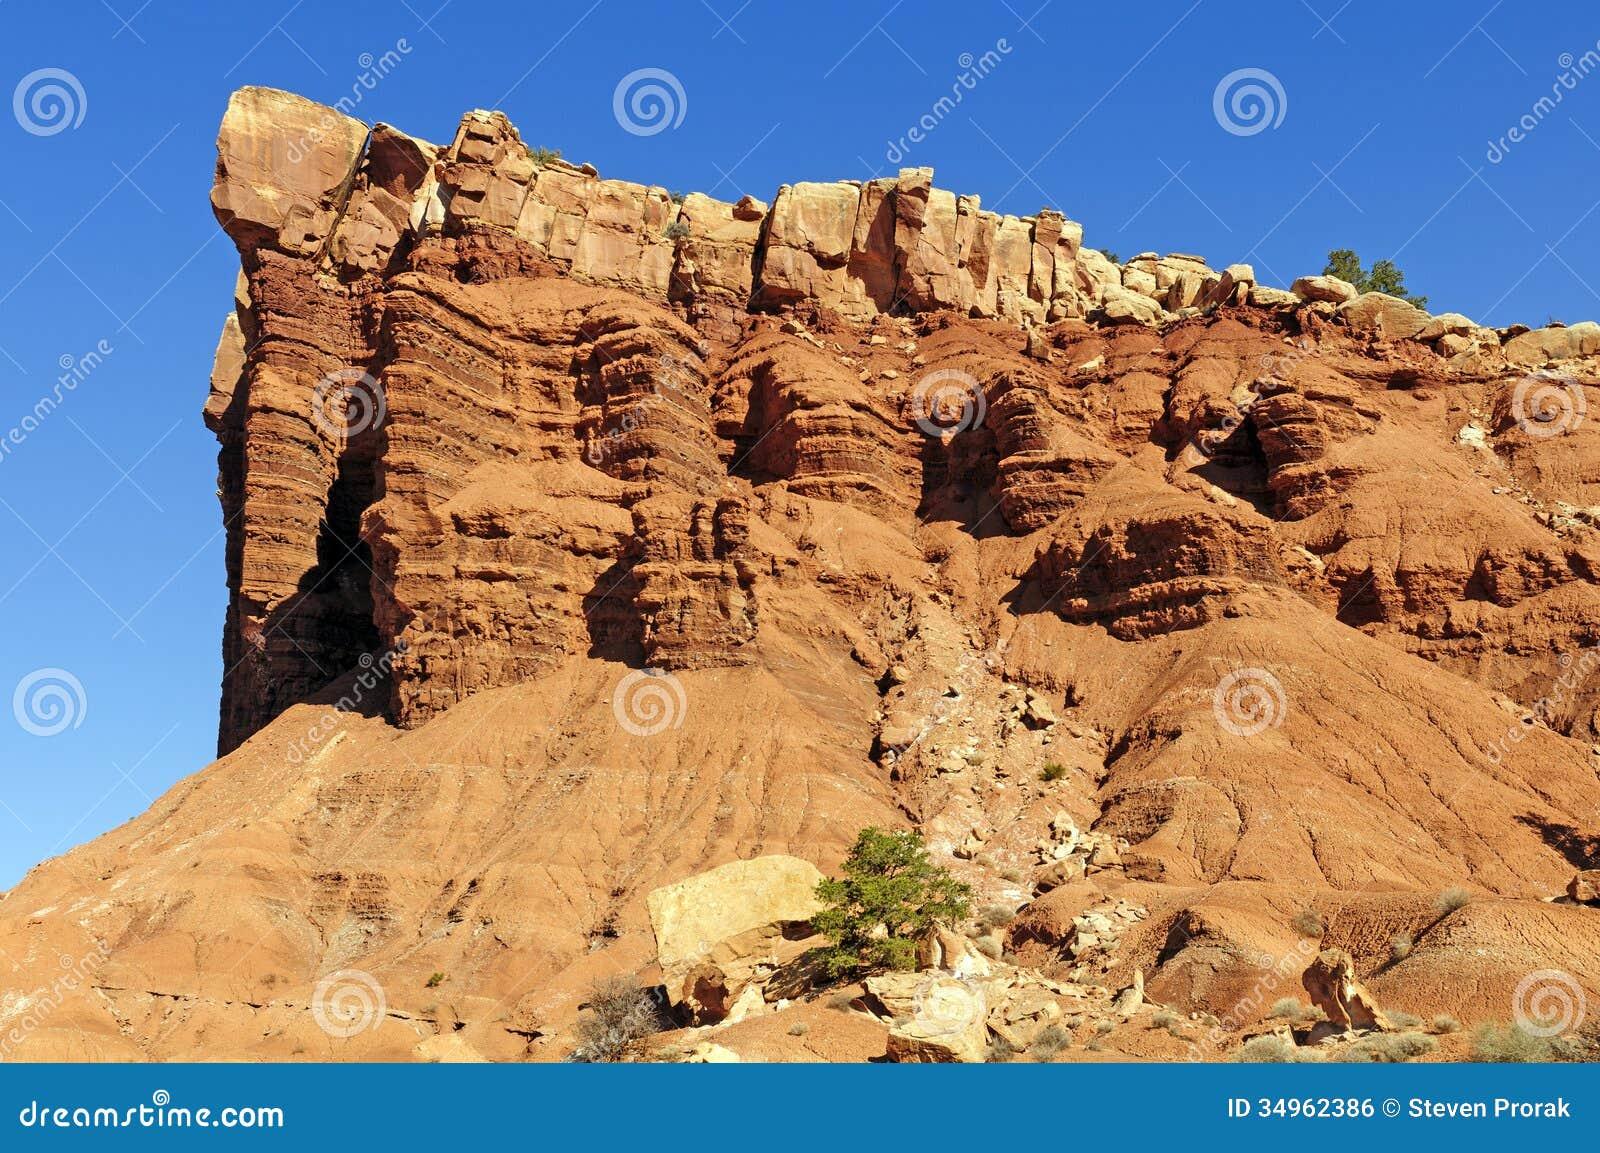 Desert Rock Pillars : Red rock columns in the desert royalty free stock image